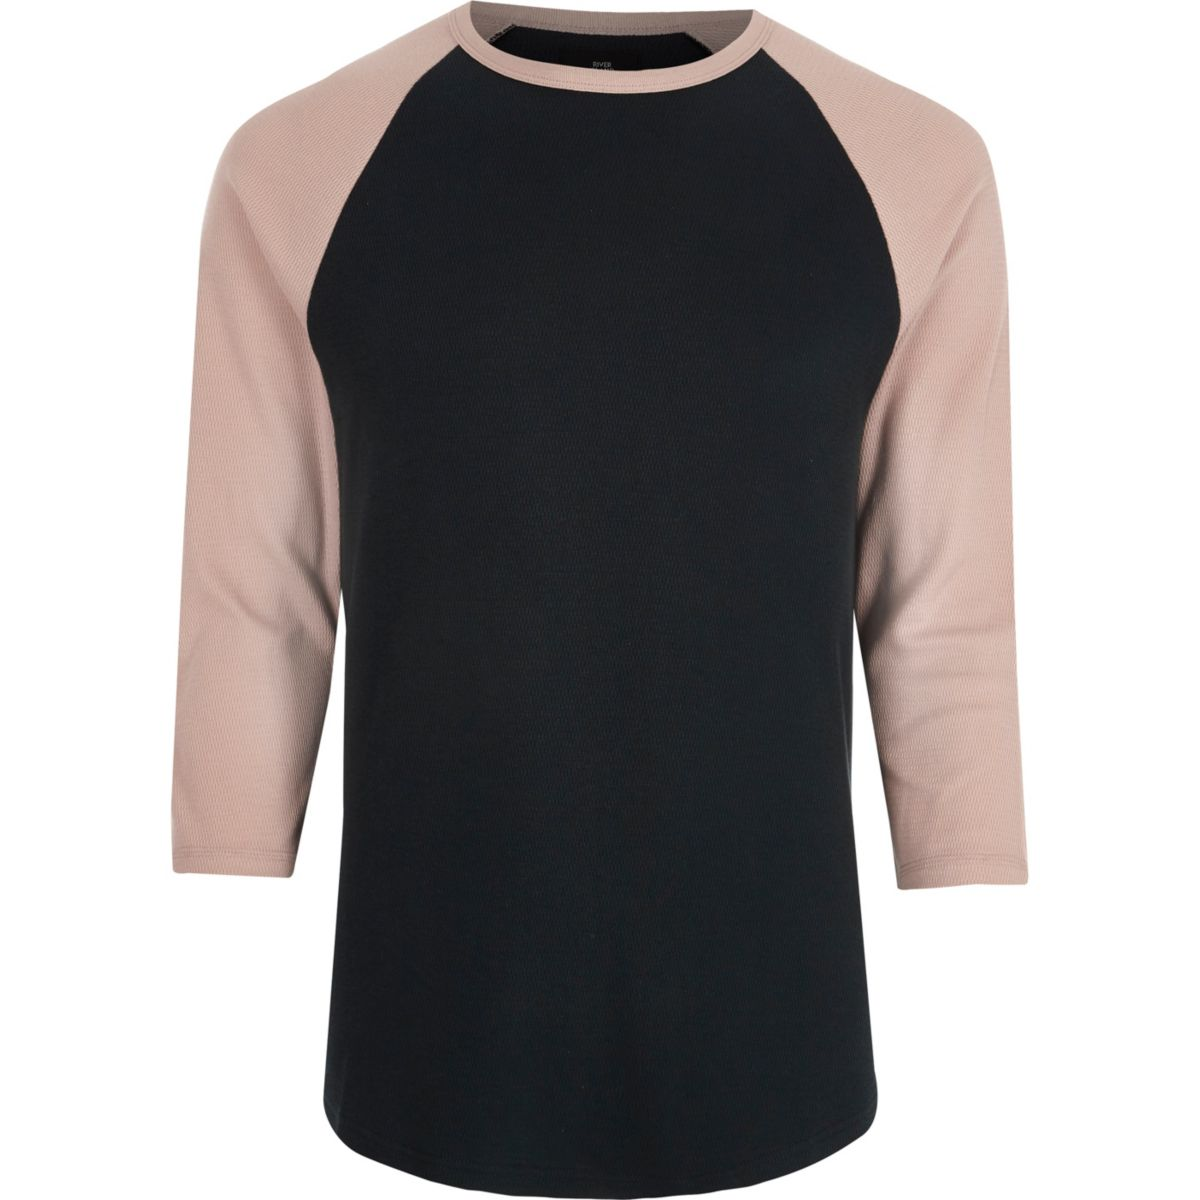 Pink three quarter raglan sleeve T-shirt